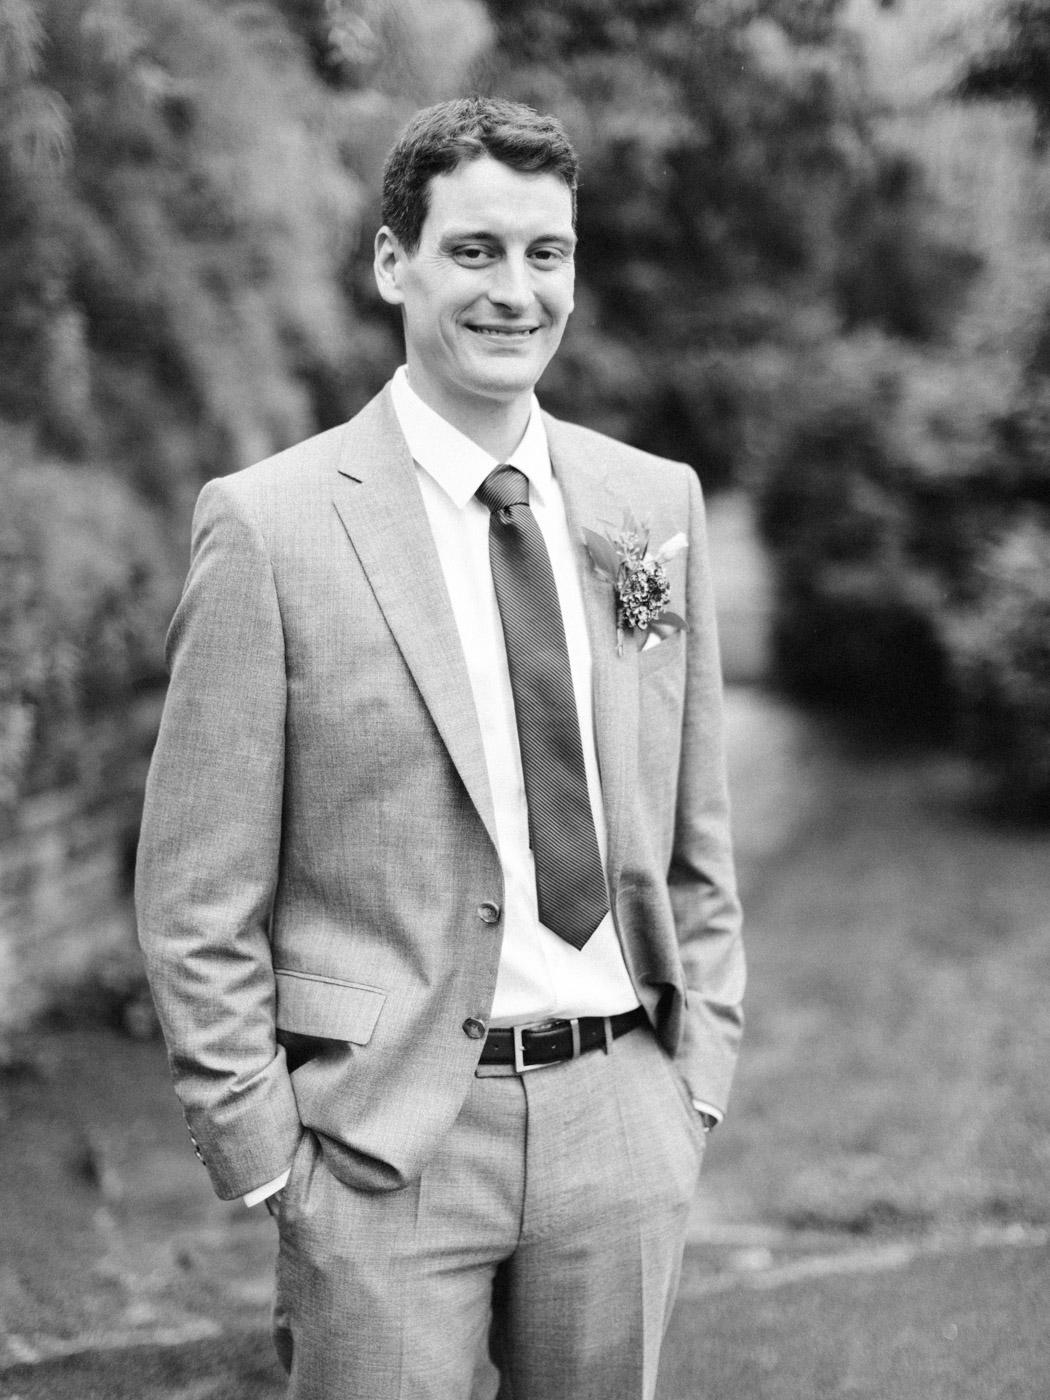 Toronto-wedding-photographer-intimate-classic-fine-art-elopement-ottawa48.jpg